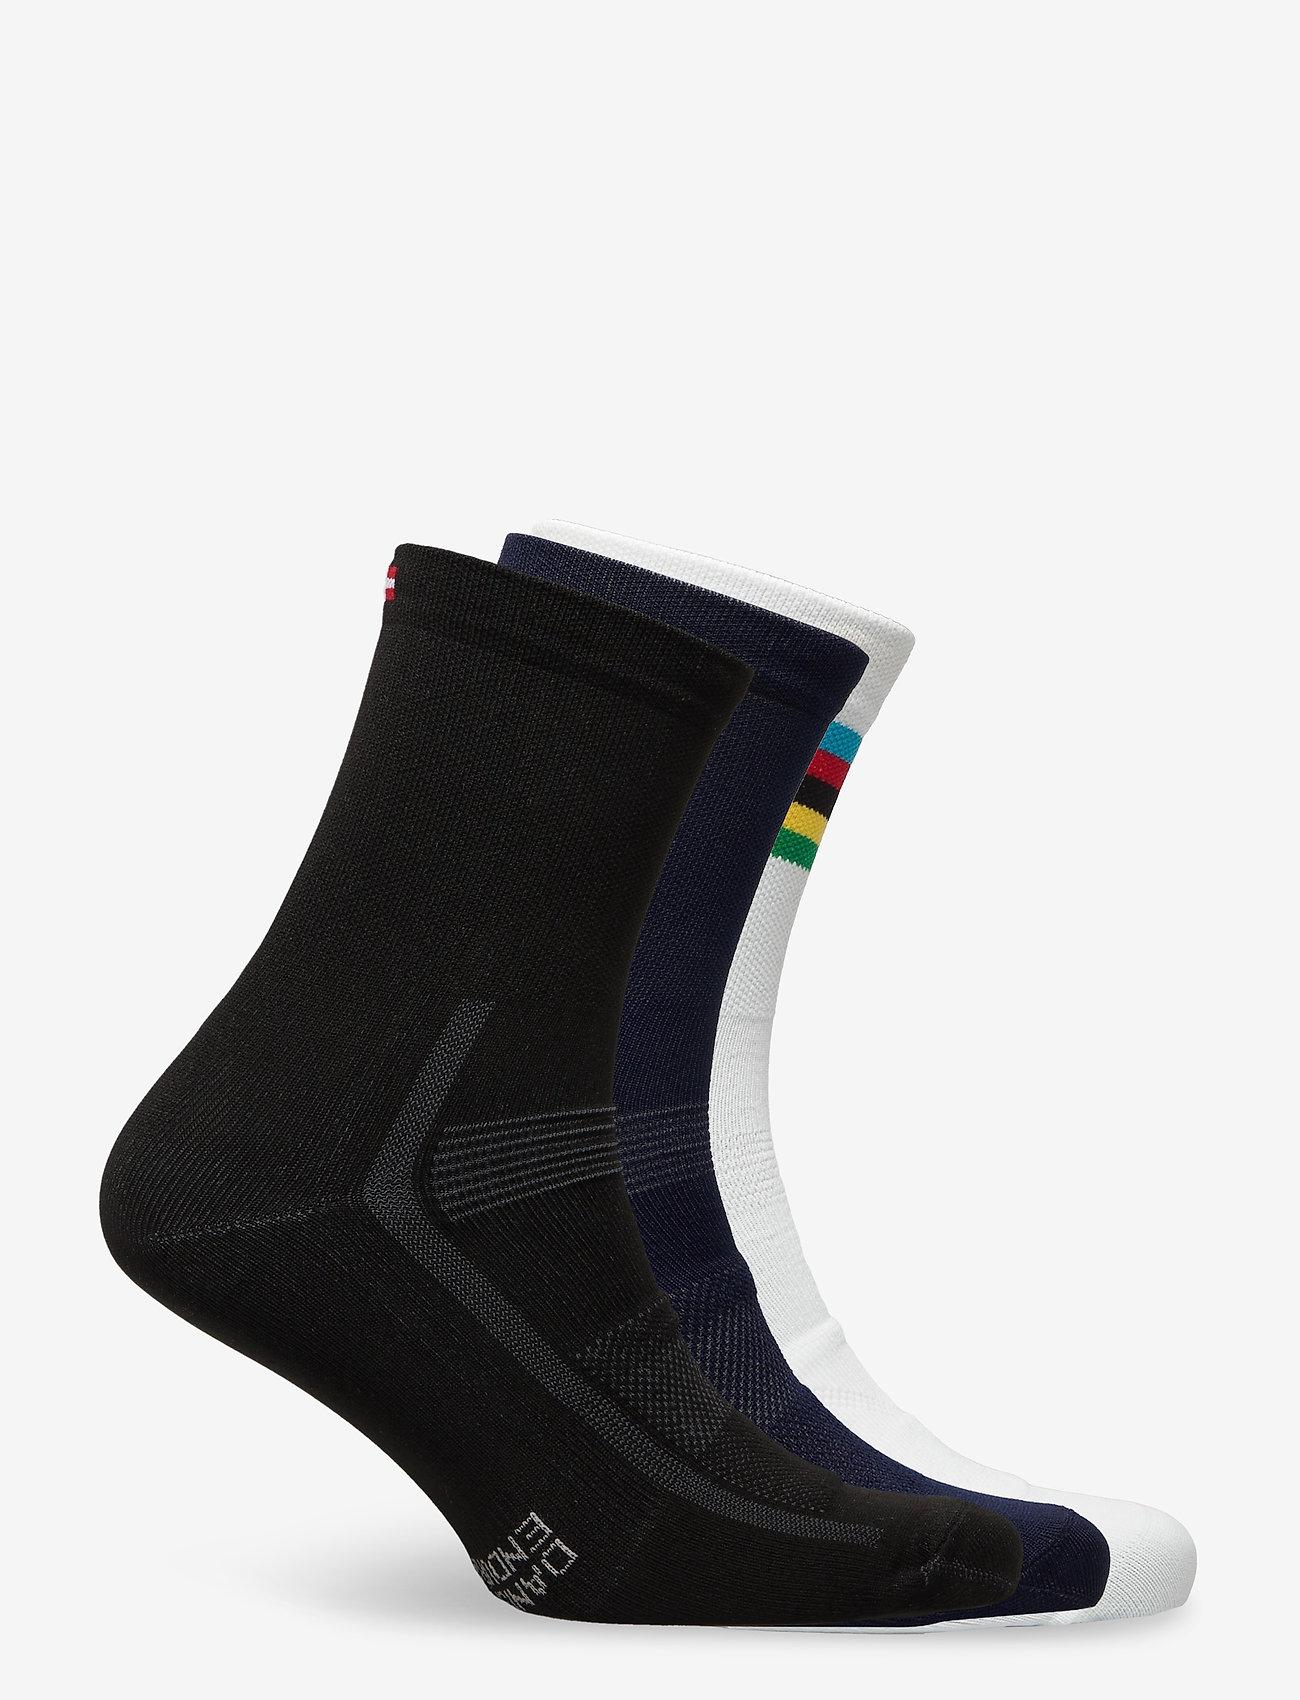 Danish Endurance - High Cycling Socks 3 Pack - kousen - multicolor (1x black, 1x blue, 1x white/stripes) - 1